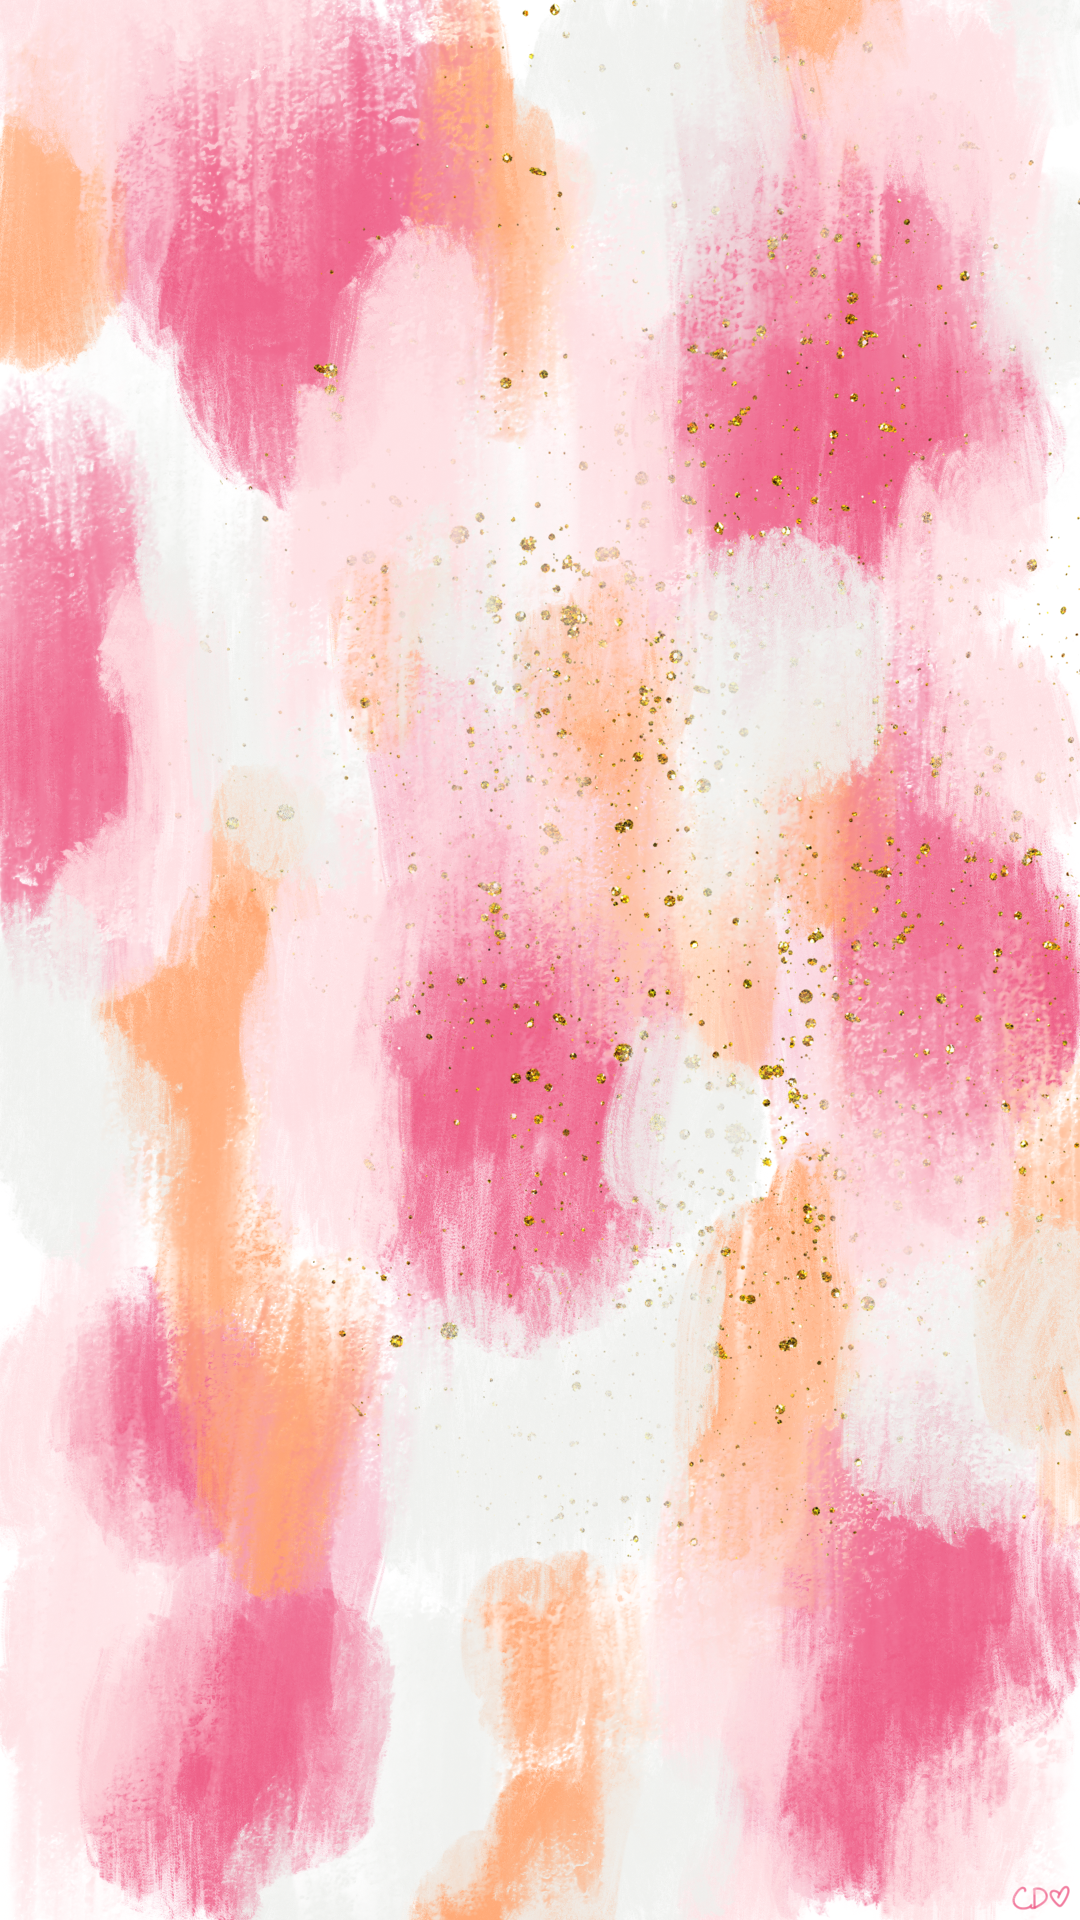 Callie Arte Danielle Artsy Background Iphone Background Wallpaper Ipad Wallpaper